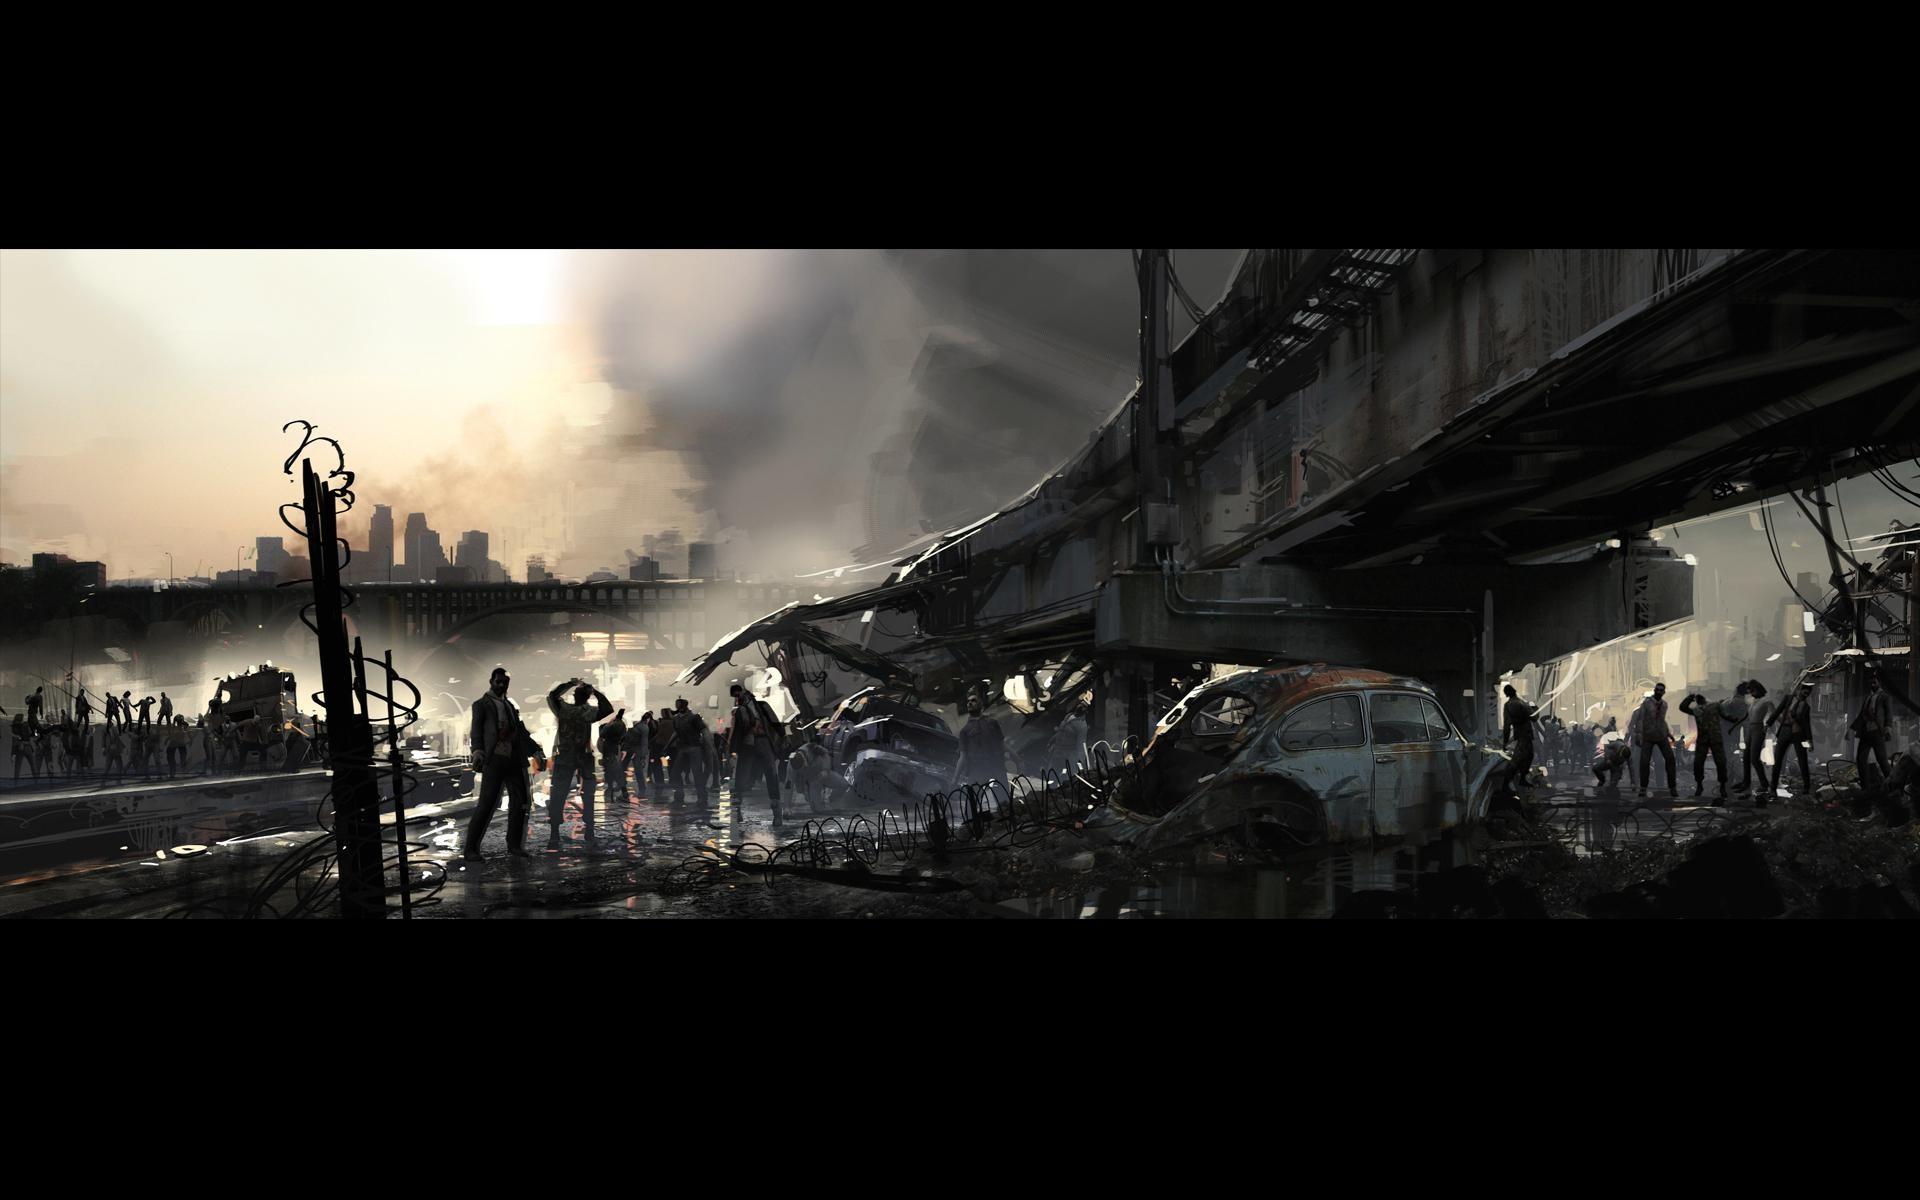 1920x1200 hd zombie apocalypse wallpaper backgrounds hd zombie apocalypse anny